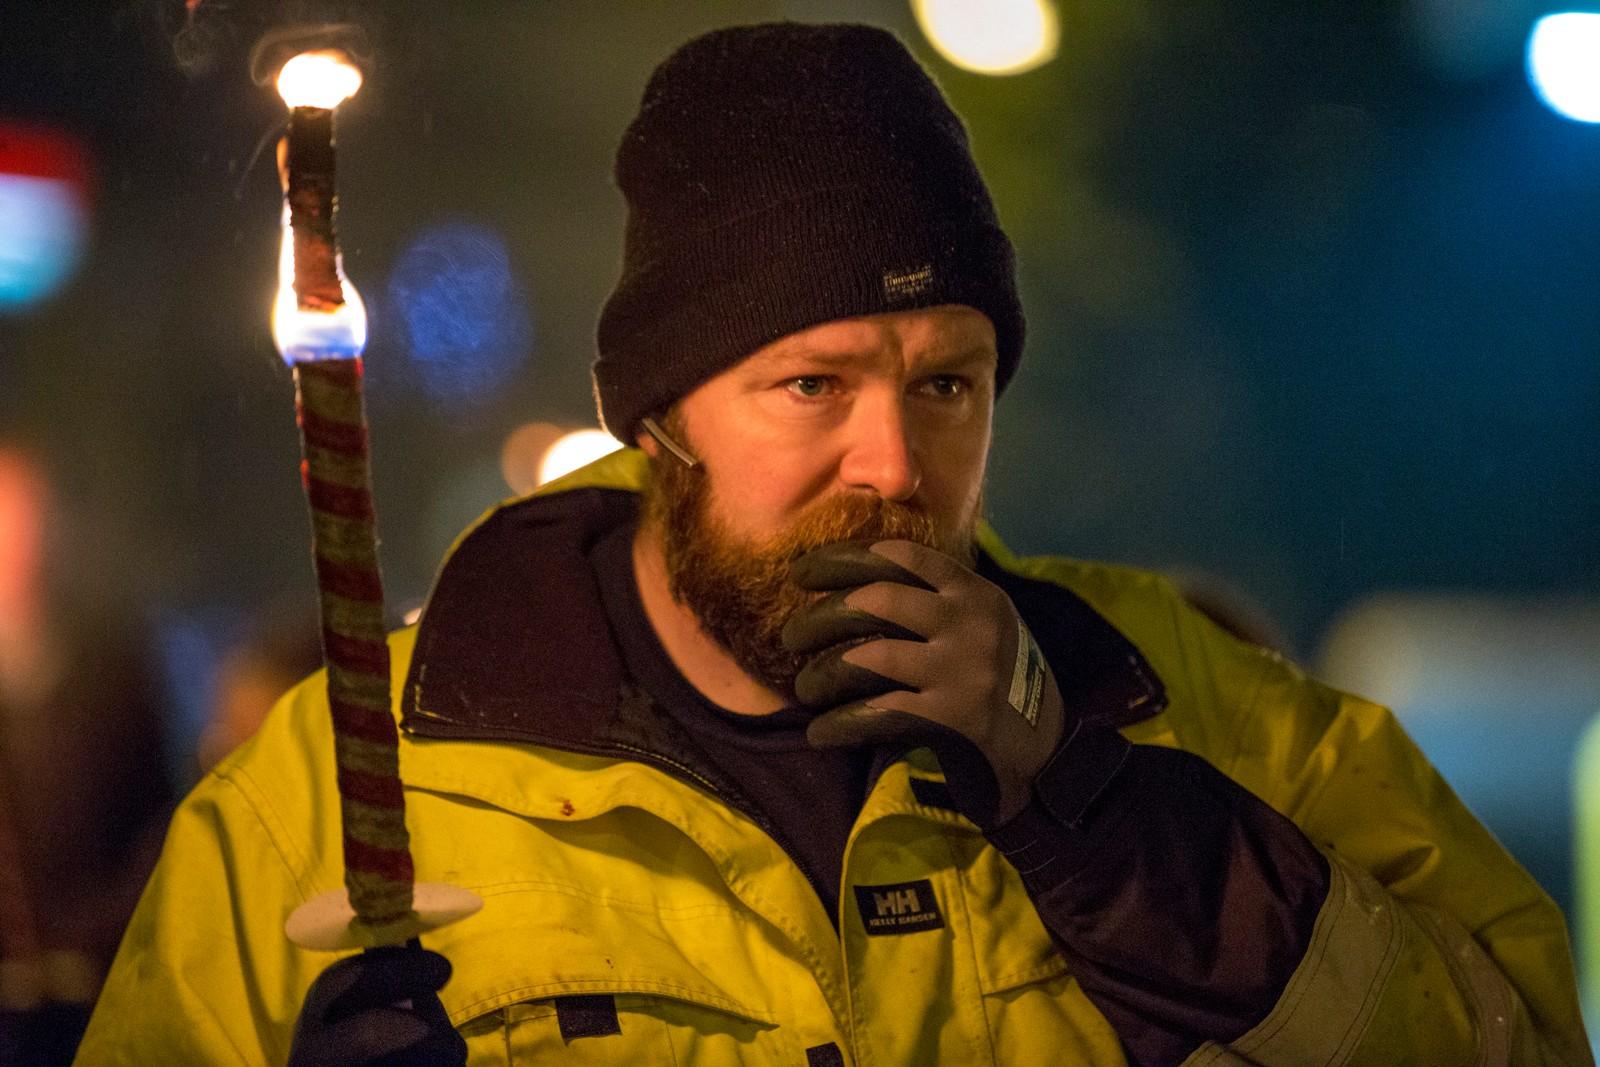 Ole Erik Thingnes, som også protesterte i februar, var også i fakkeltoget.